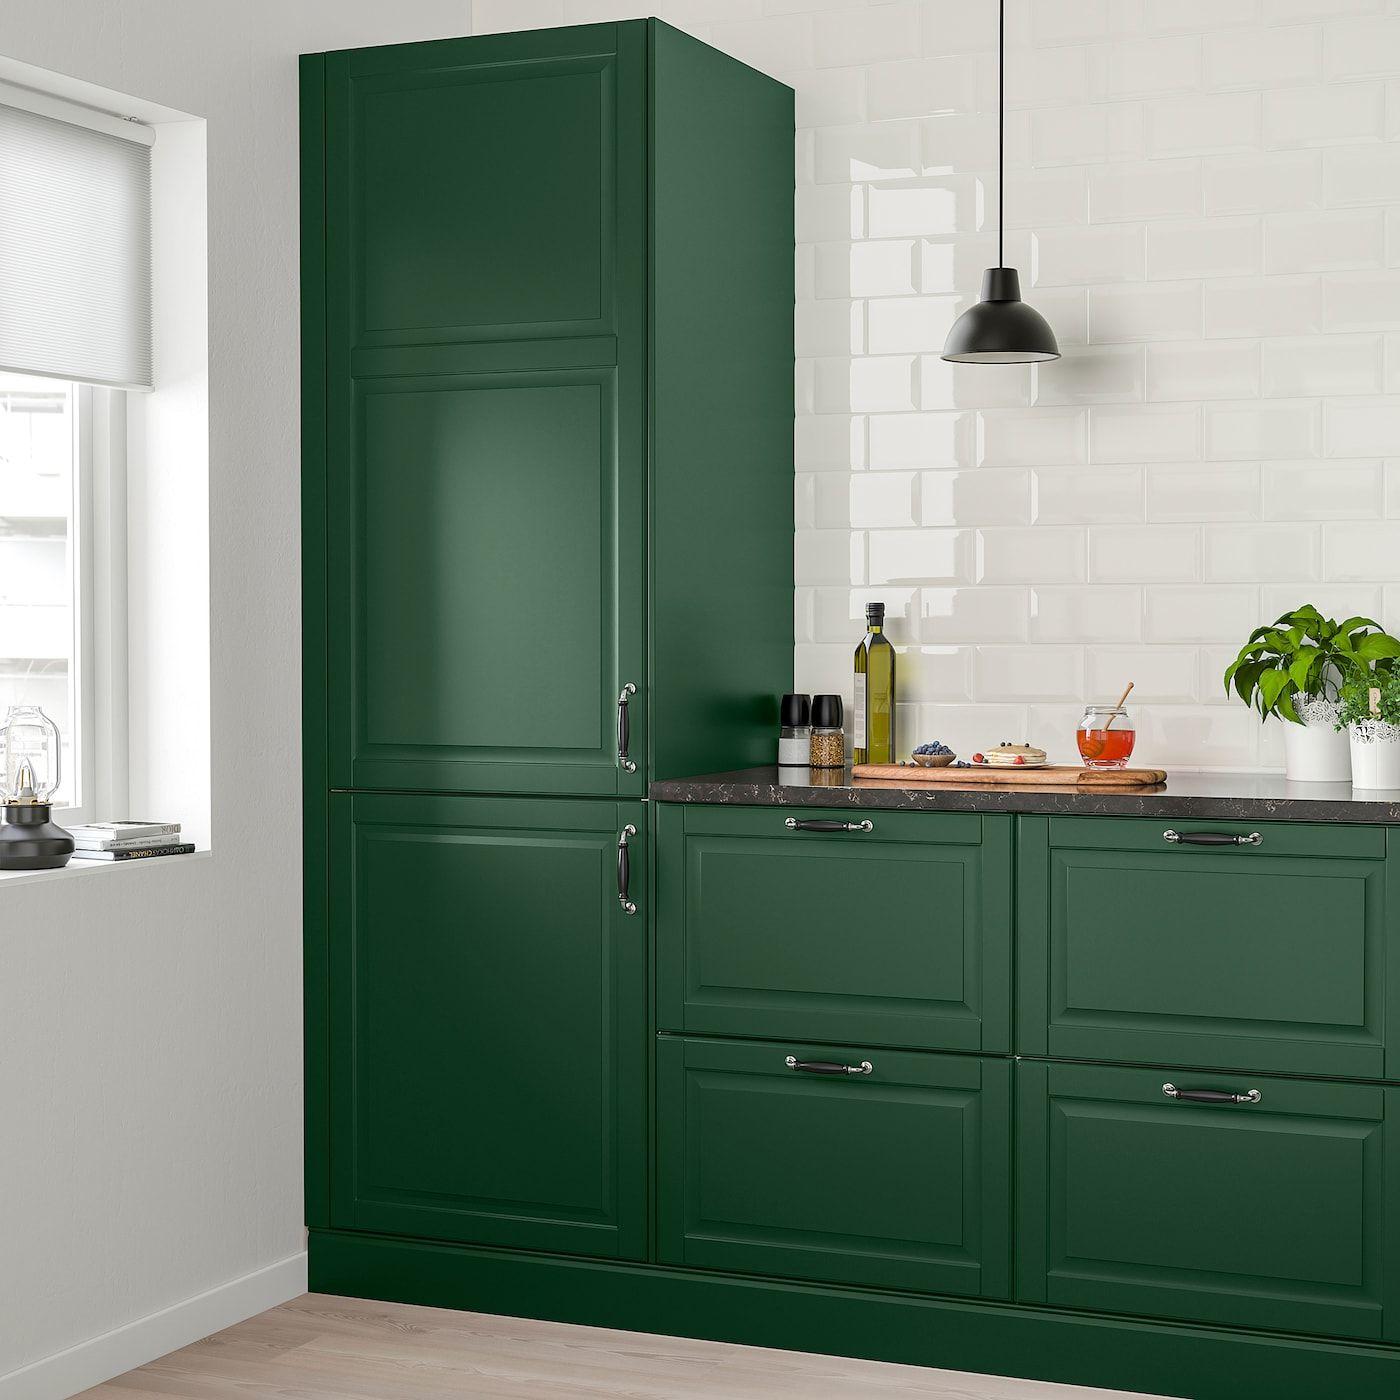 Ikea Kitchen Cabinets Green